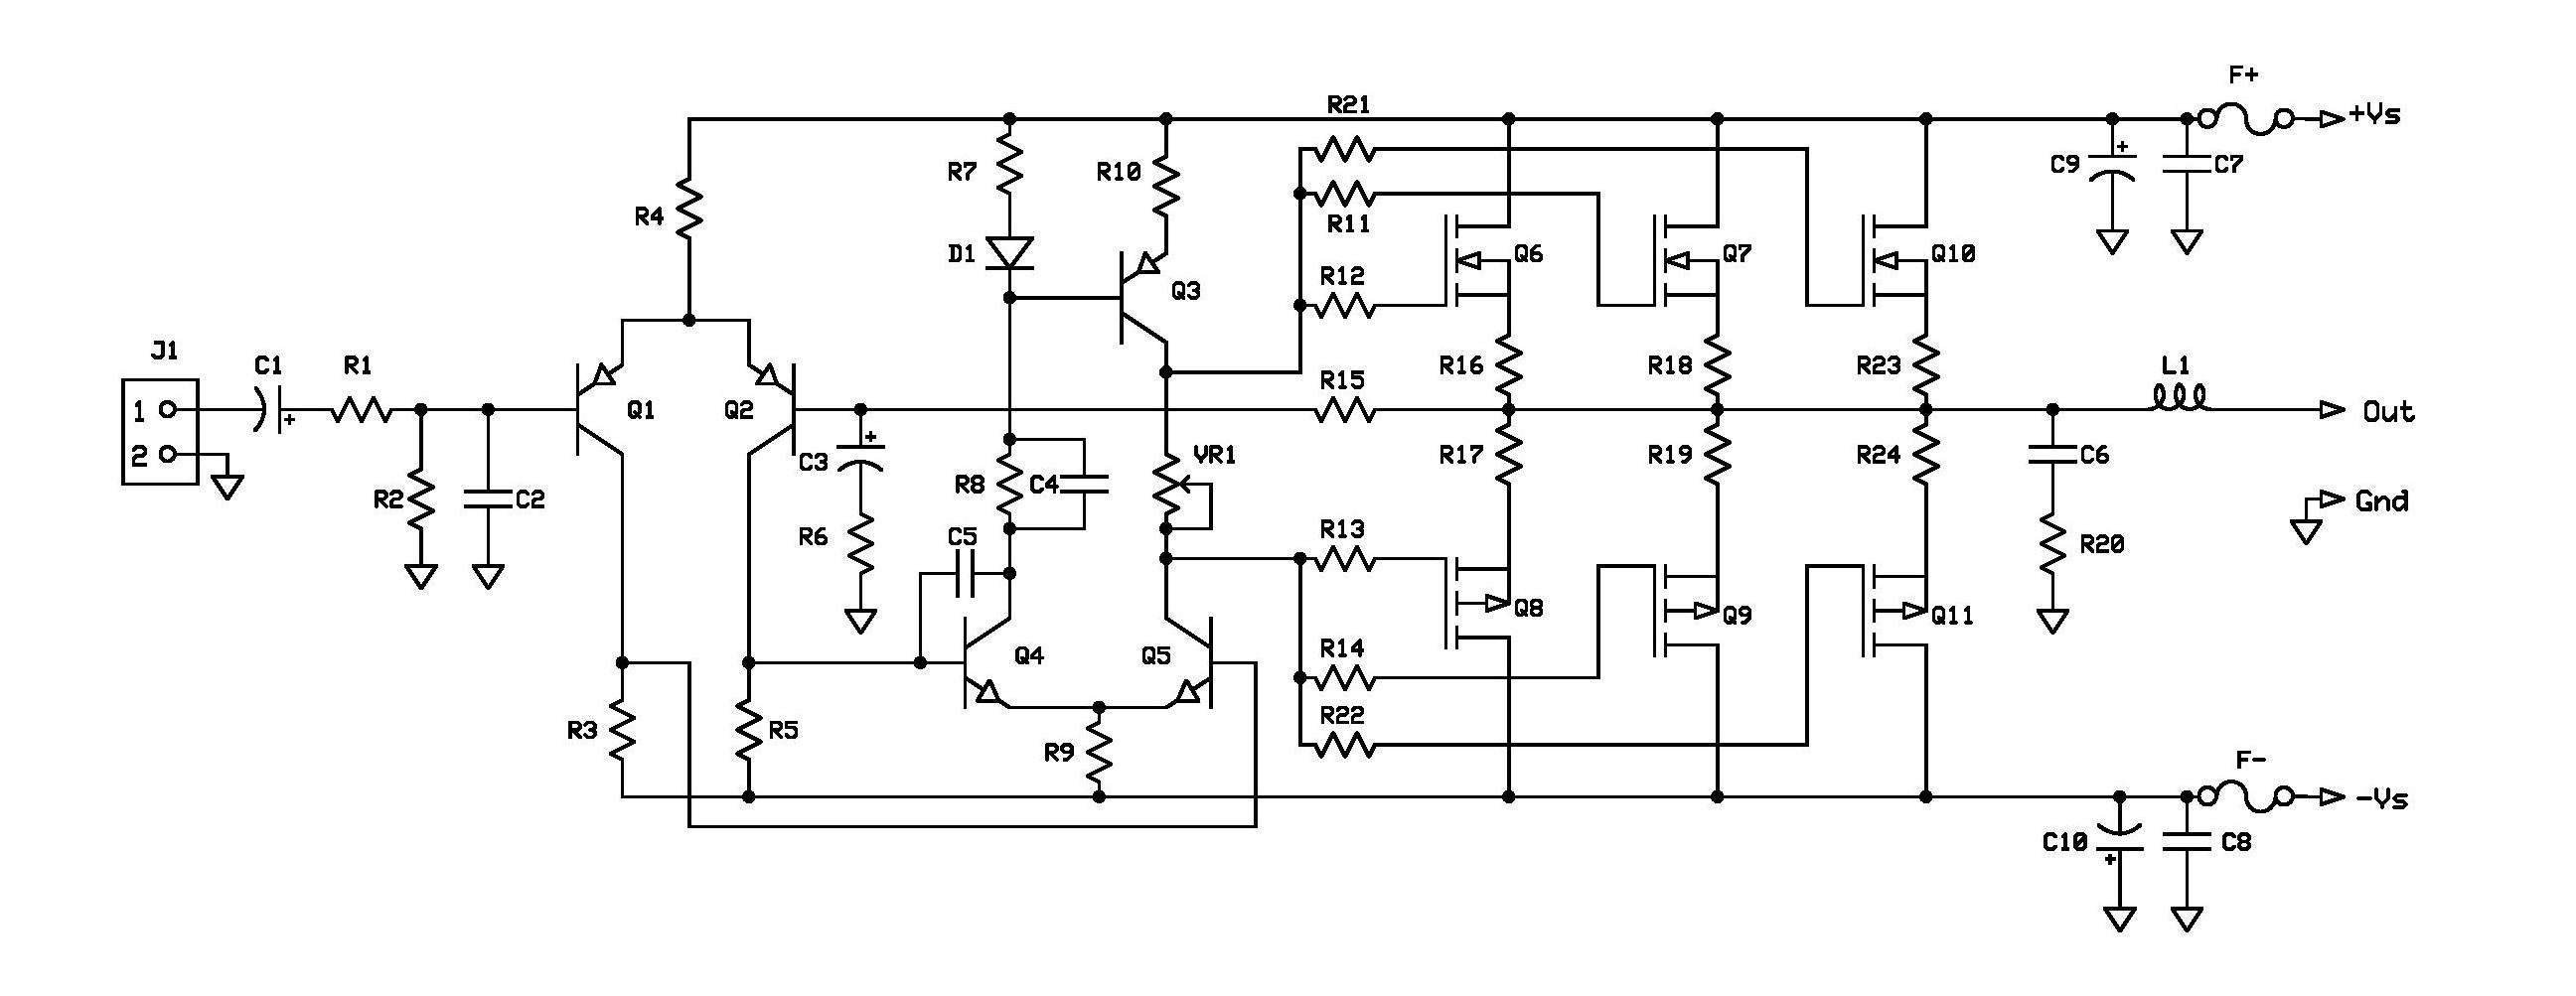 [FE_5490] Mosfet Amplifier Circuit Diagram Schematic Wiring